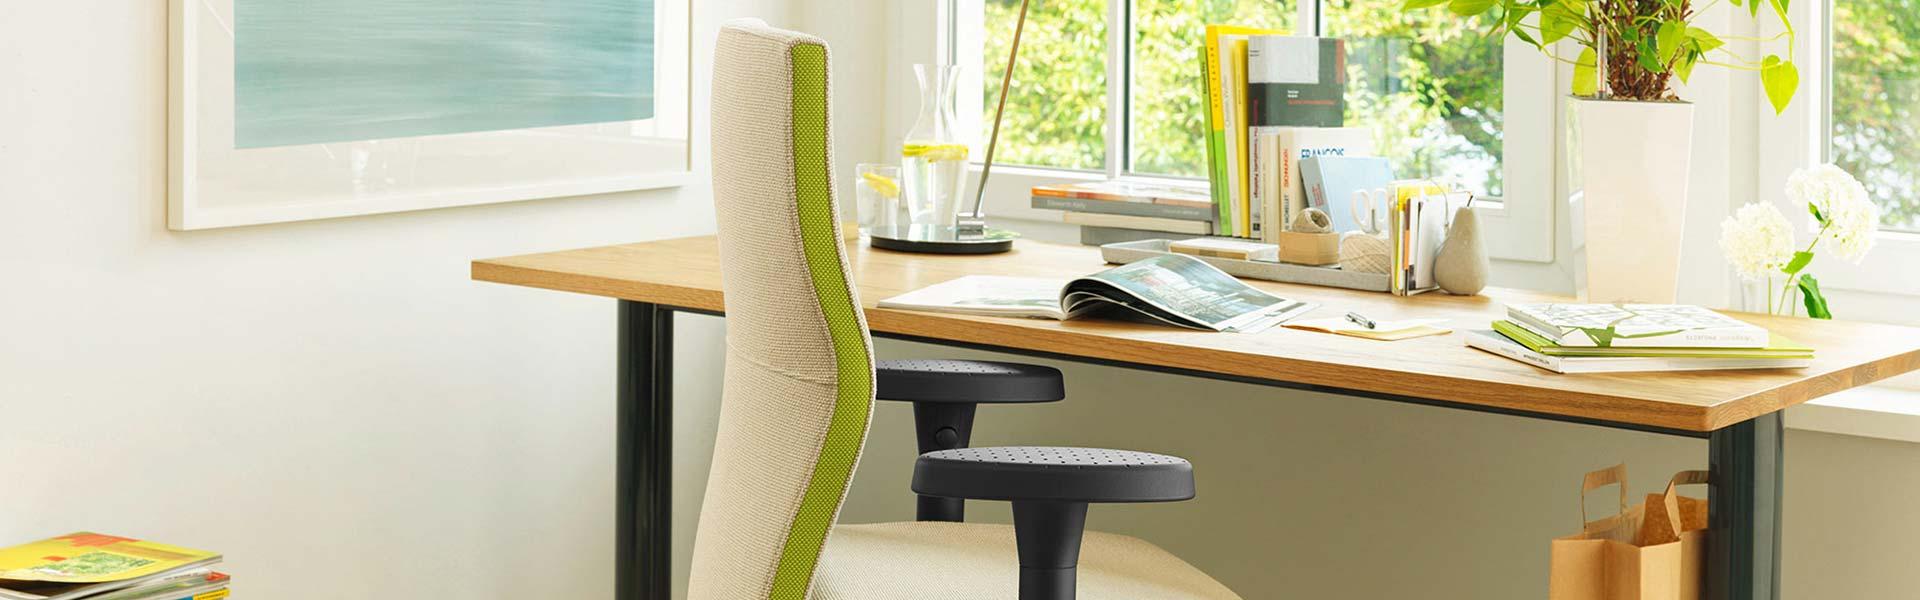 orthop dische ergonomische b rost hle aus berlin l ffler. Black Bedroom Furniture Sets. Home Design Ideas